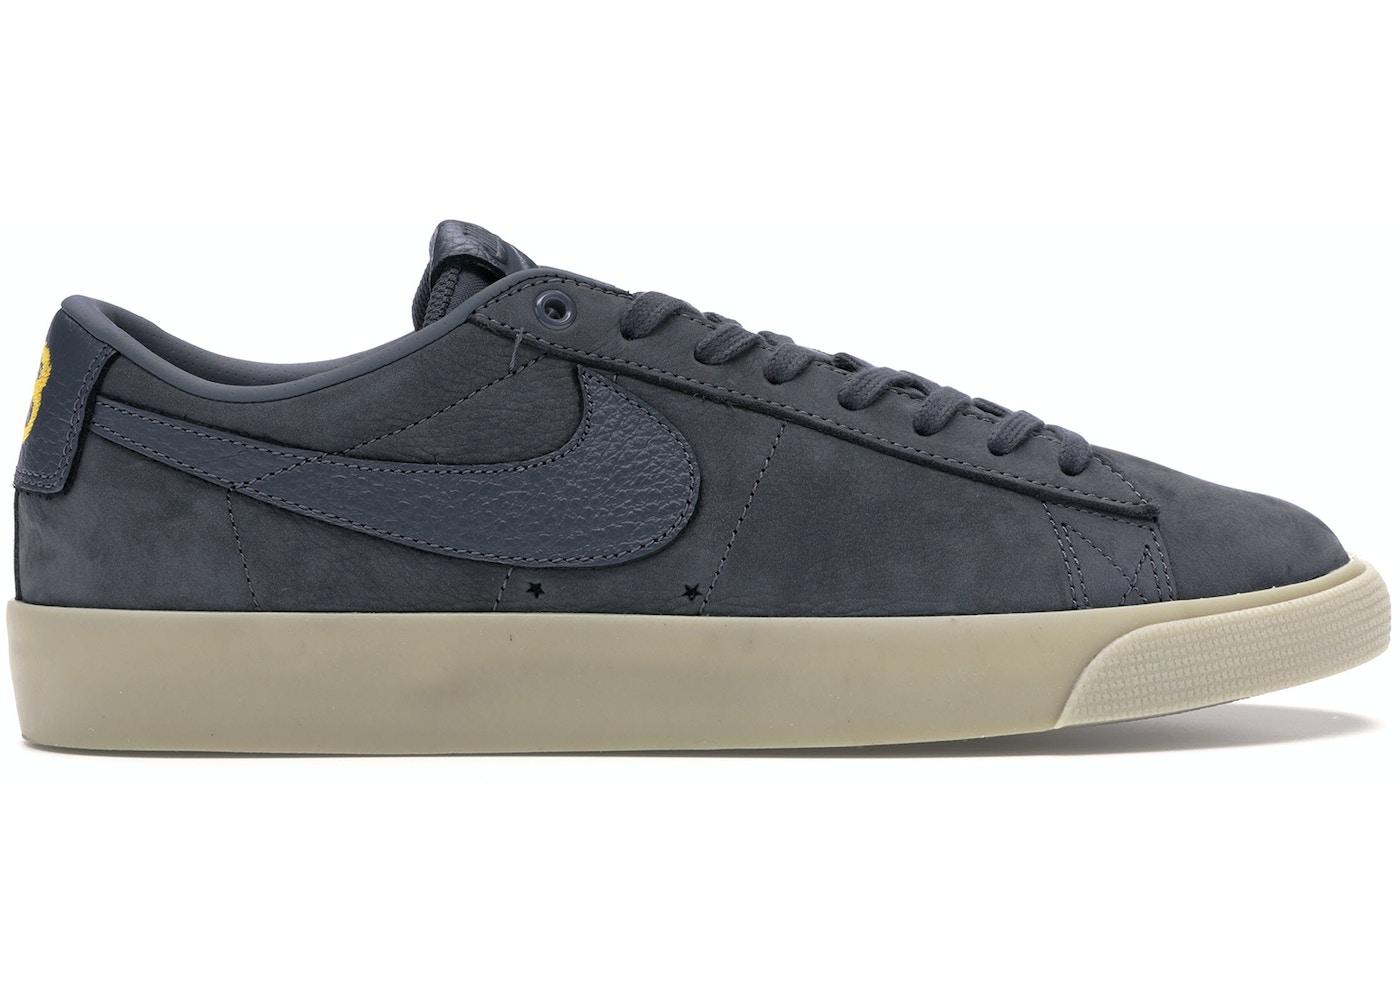 promo code 7716b 110e8 Nike SB Blazer Low Antihero Grant Taylor - AQ9941-007